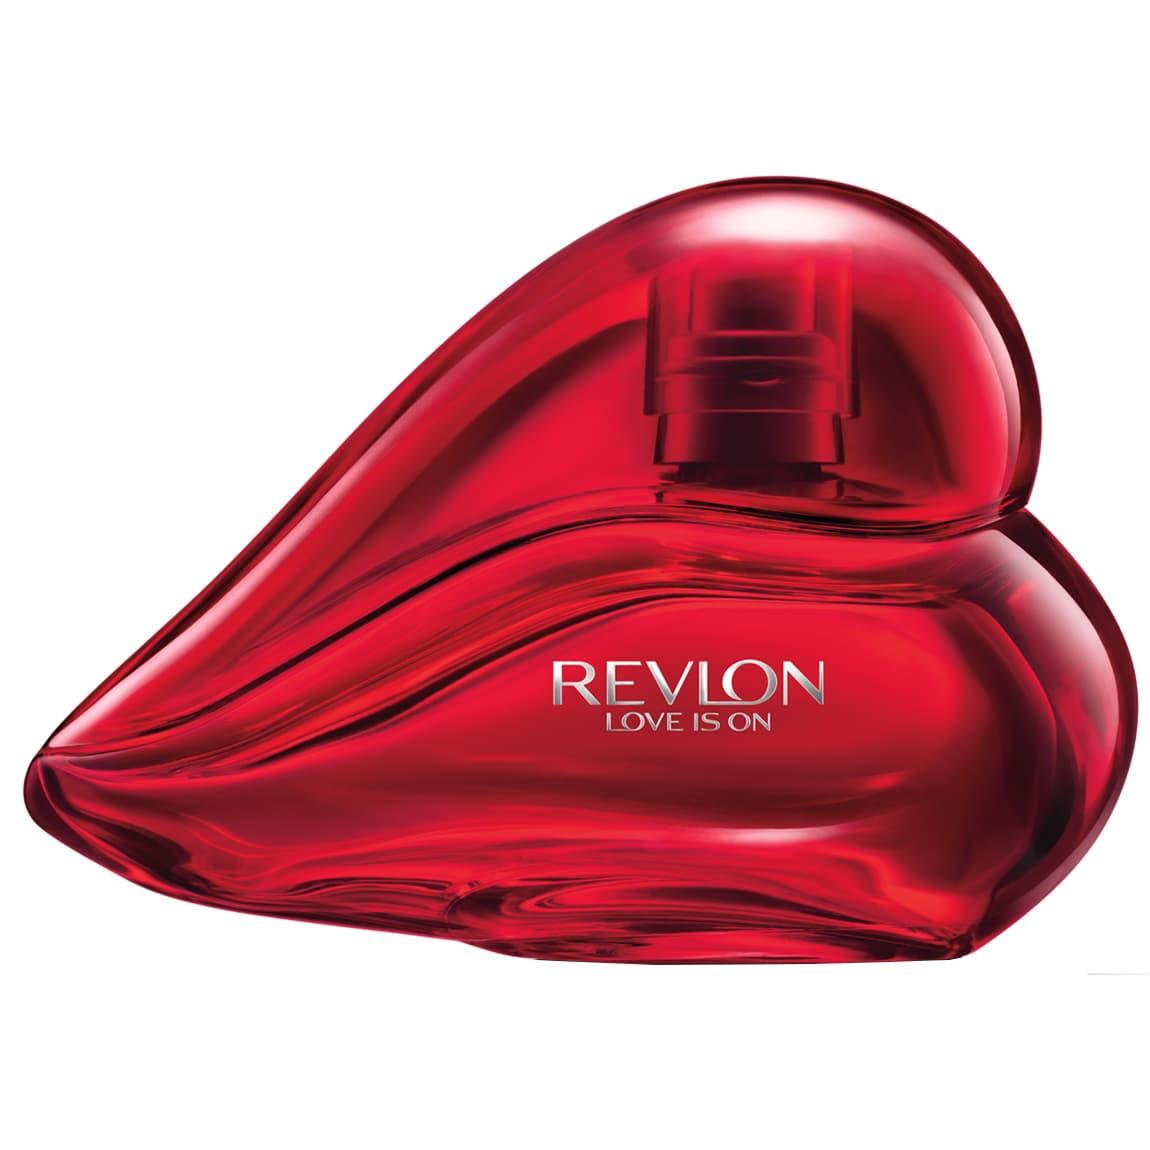 Revlon - Love is On Eau de toilette